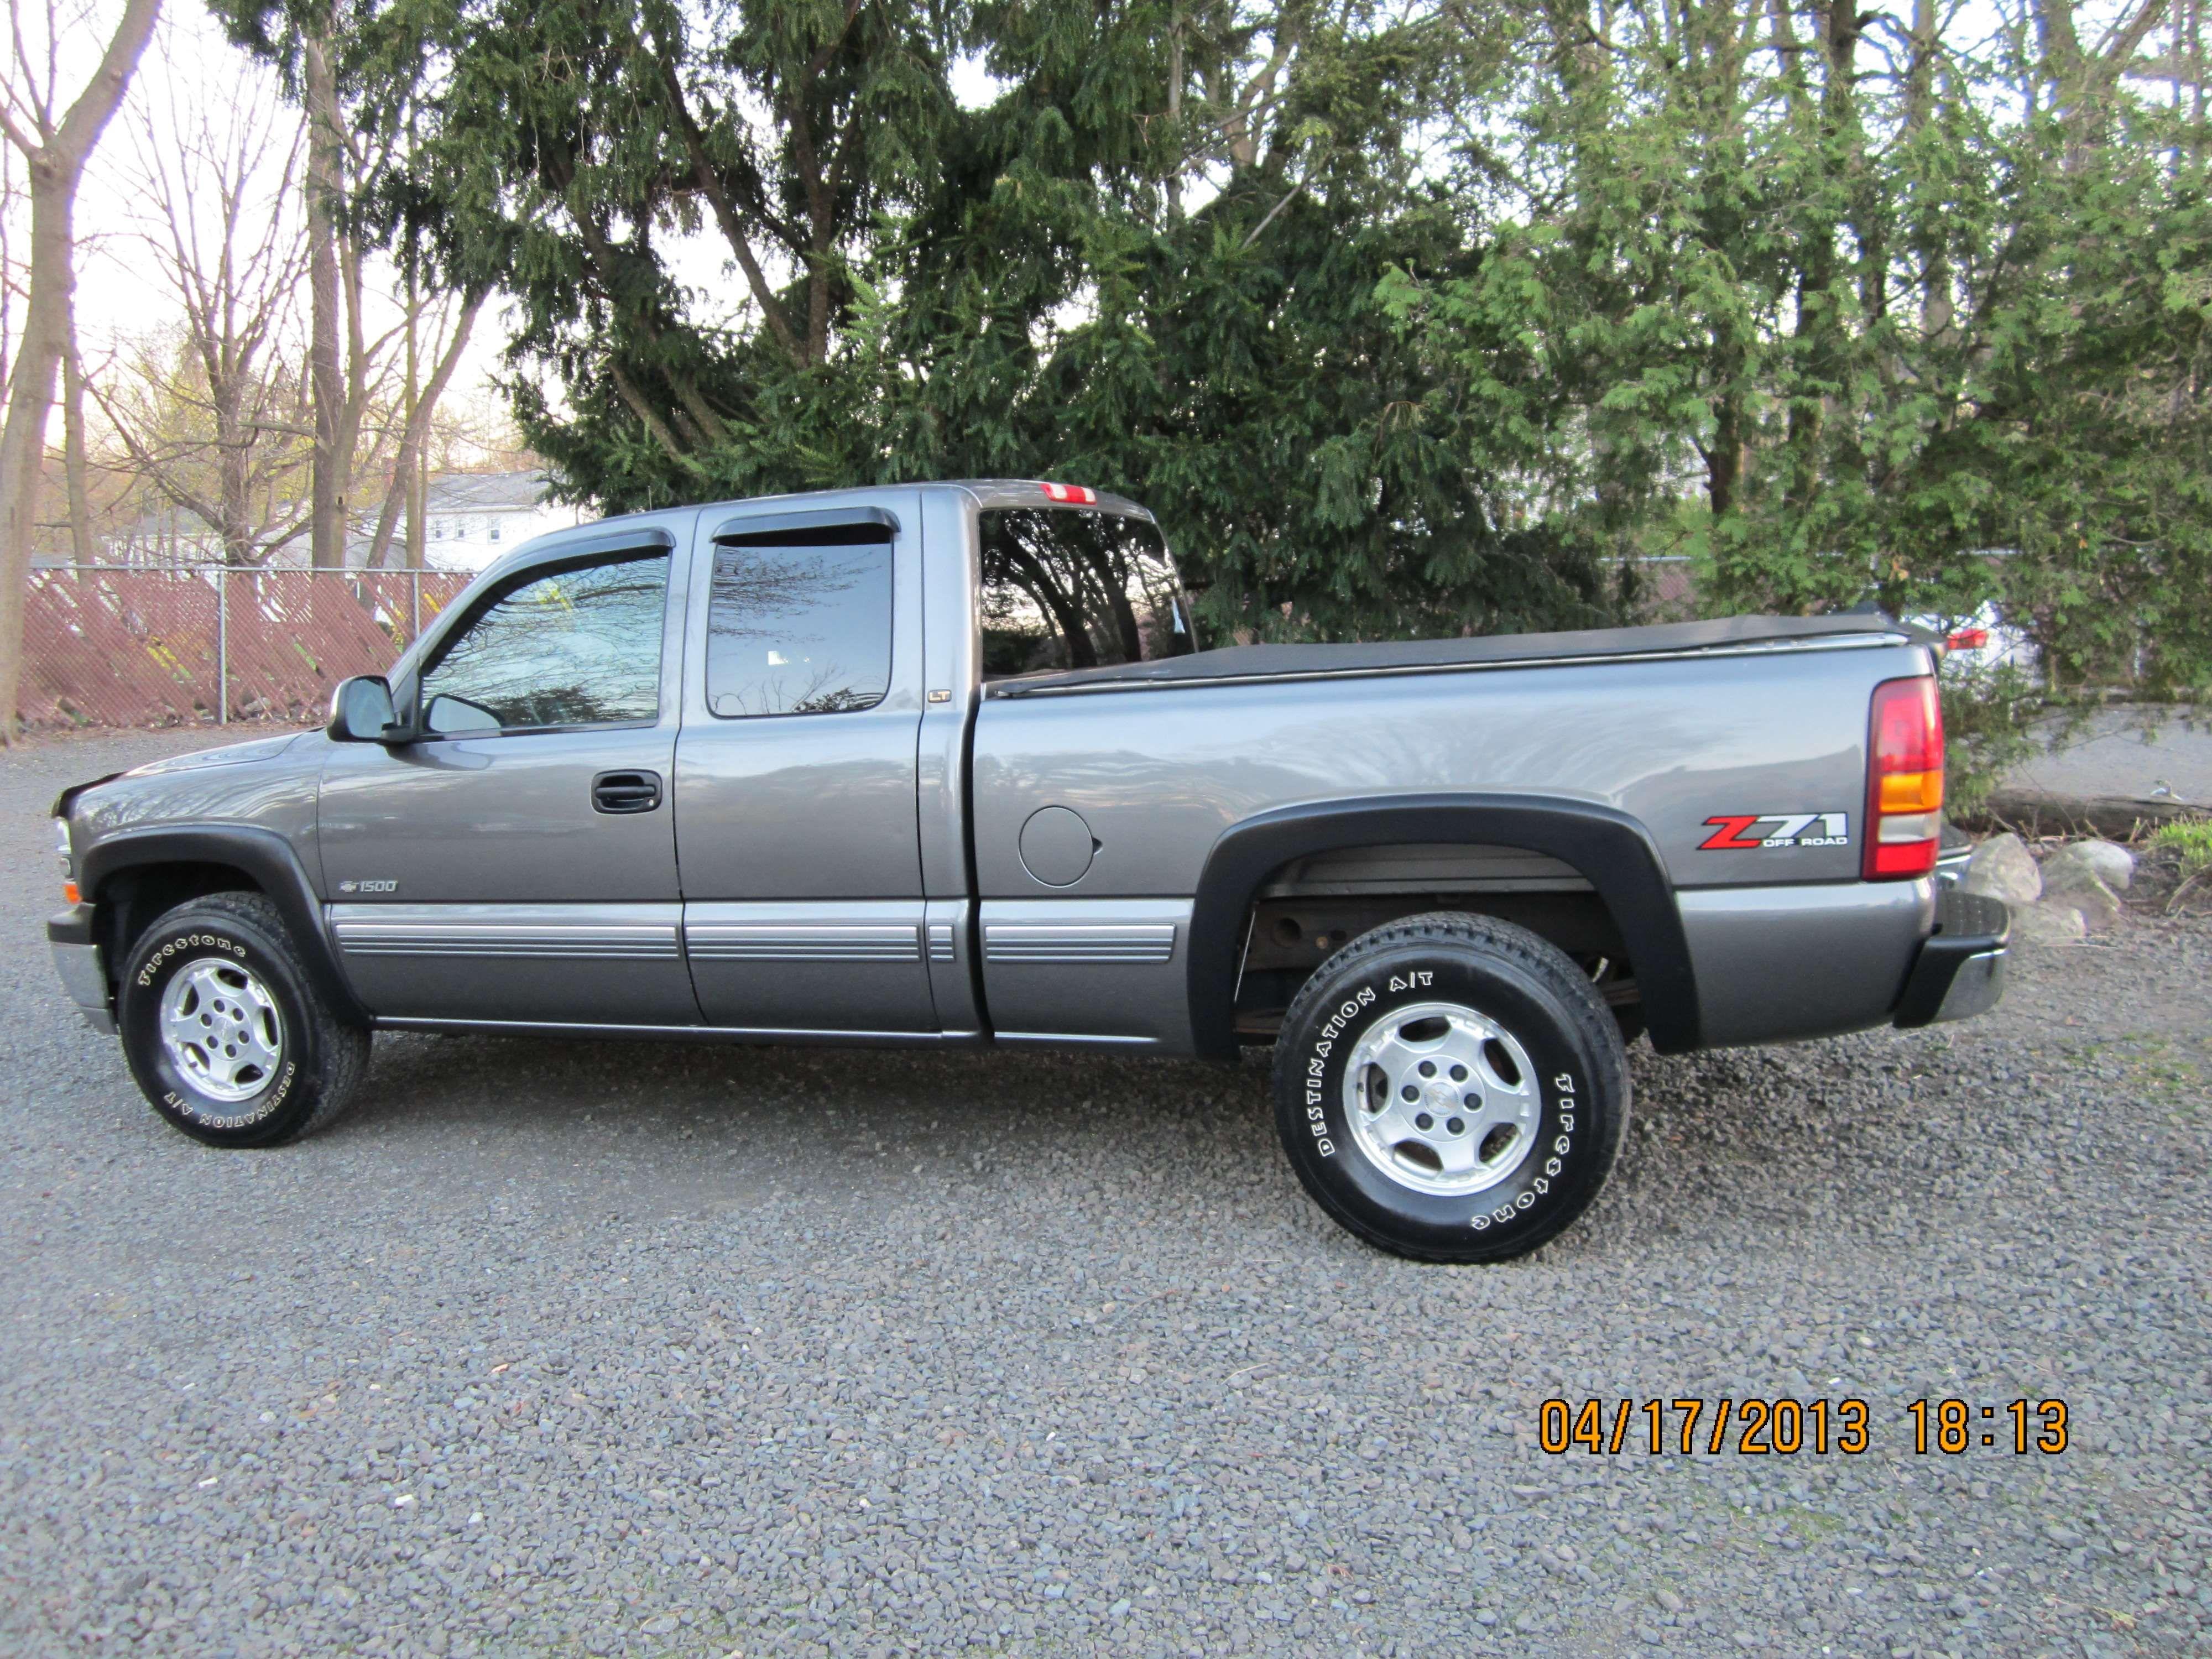 make chevrolet model silverado year 2002 body style pickup trucks exterior color gray met. Black Bedroom Furniture Sets. Home Design Ideas